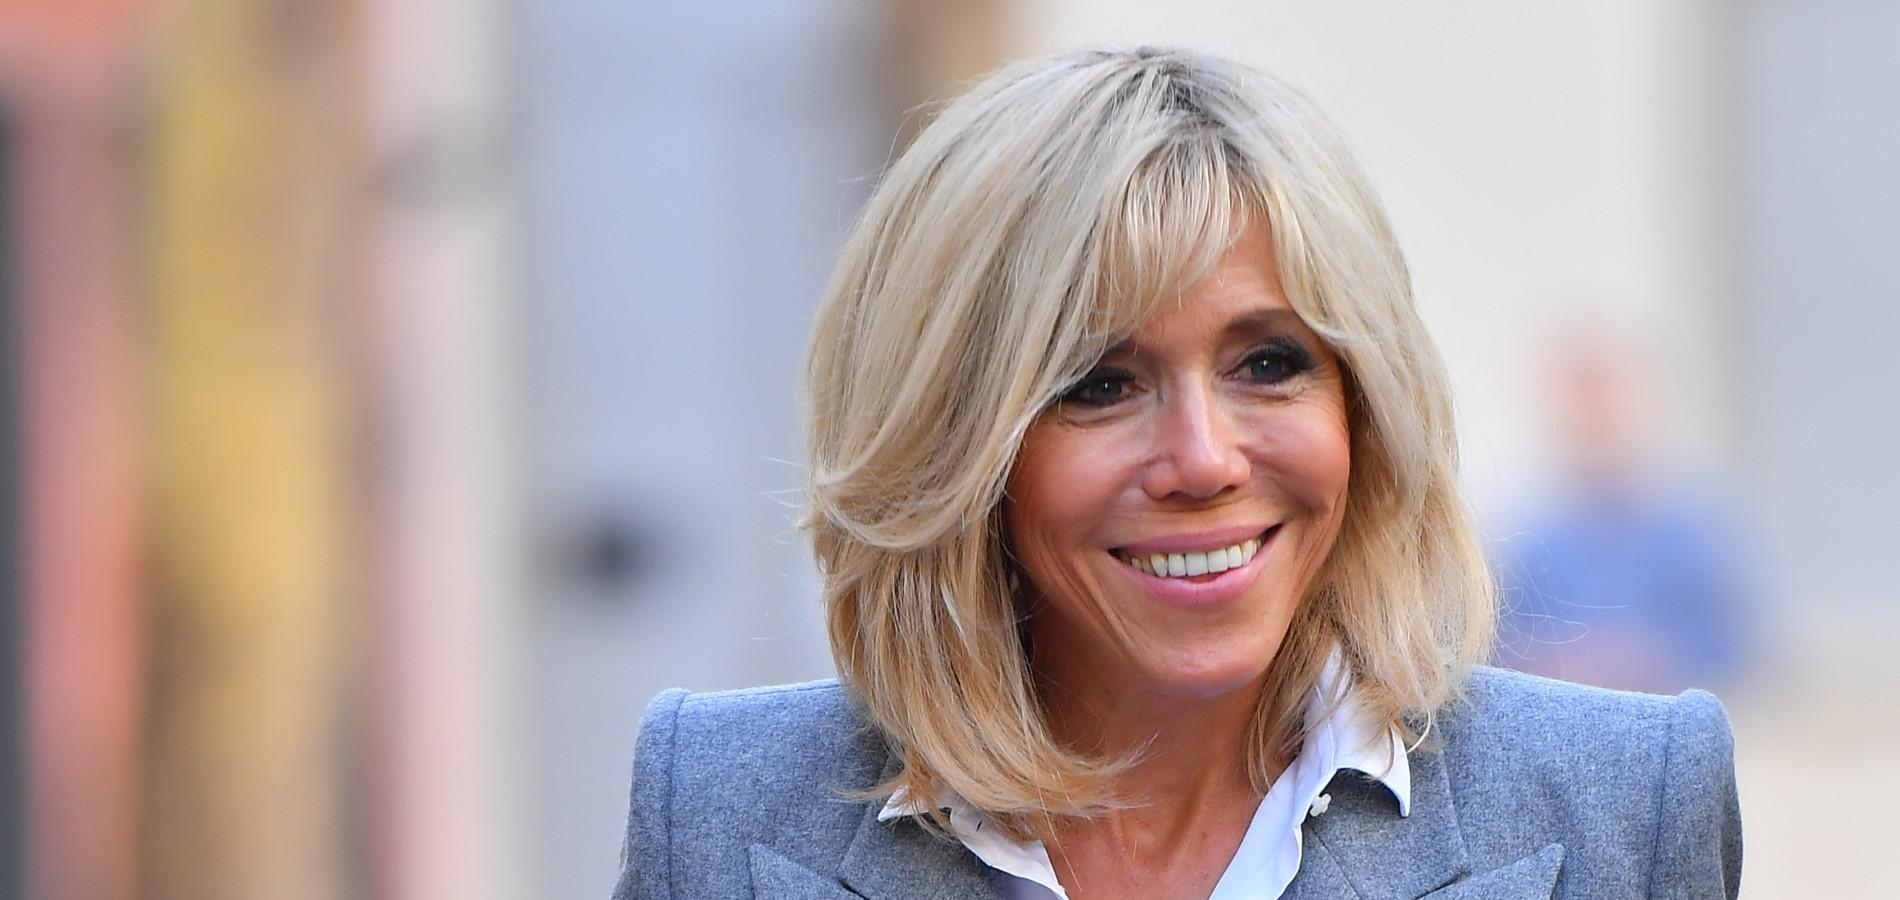 Carre Signature Frange Aleatoire Blond Changeant La Coiffure De Brigitte Macron Passee Au Crible Madame Figaro